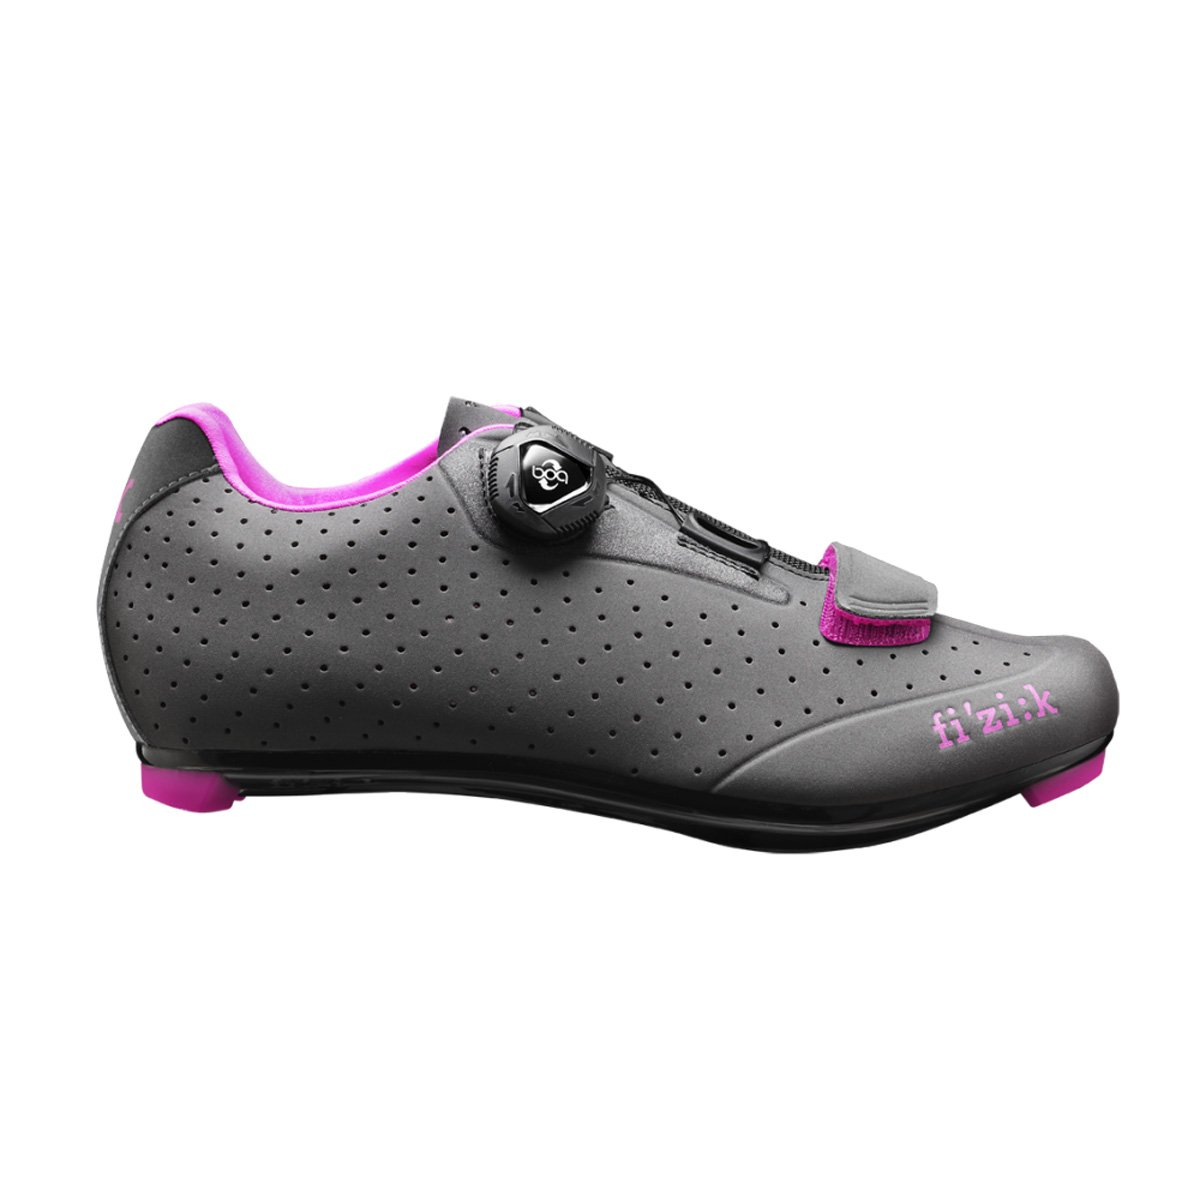 Fizik R5B Donna BOA Shoe with Fuschia Trim B01DW8JGLA Size 39.5|Anthracite